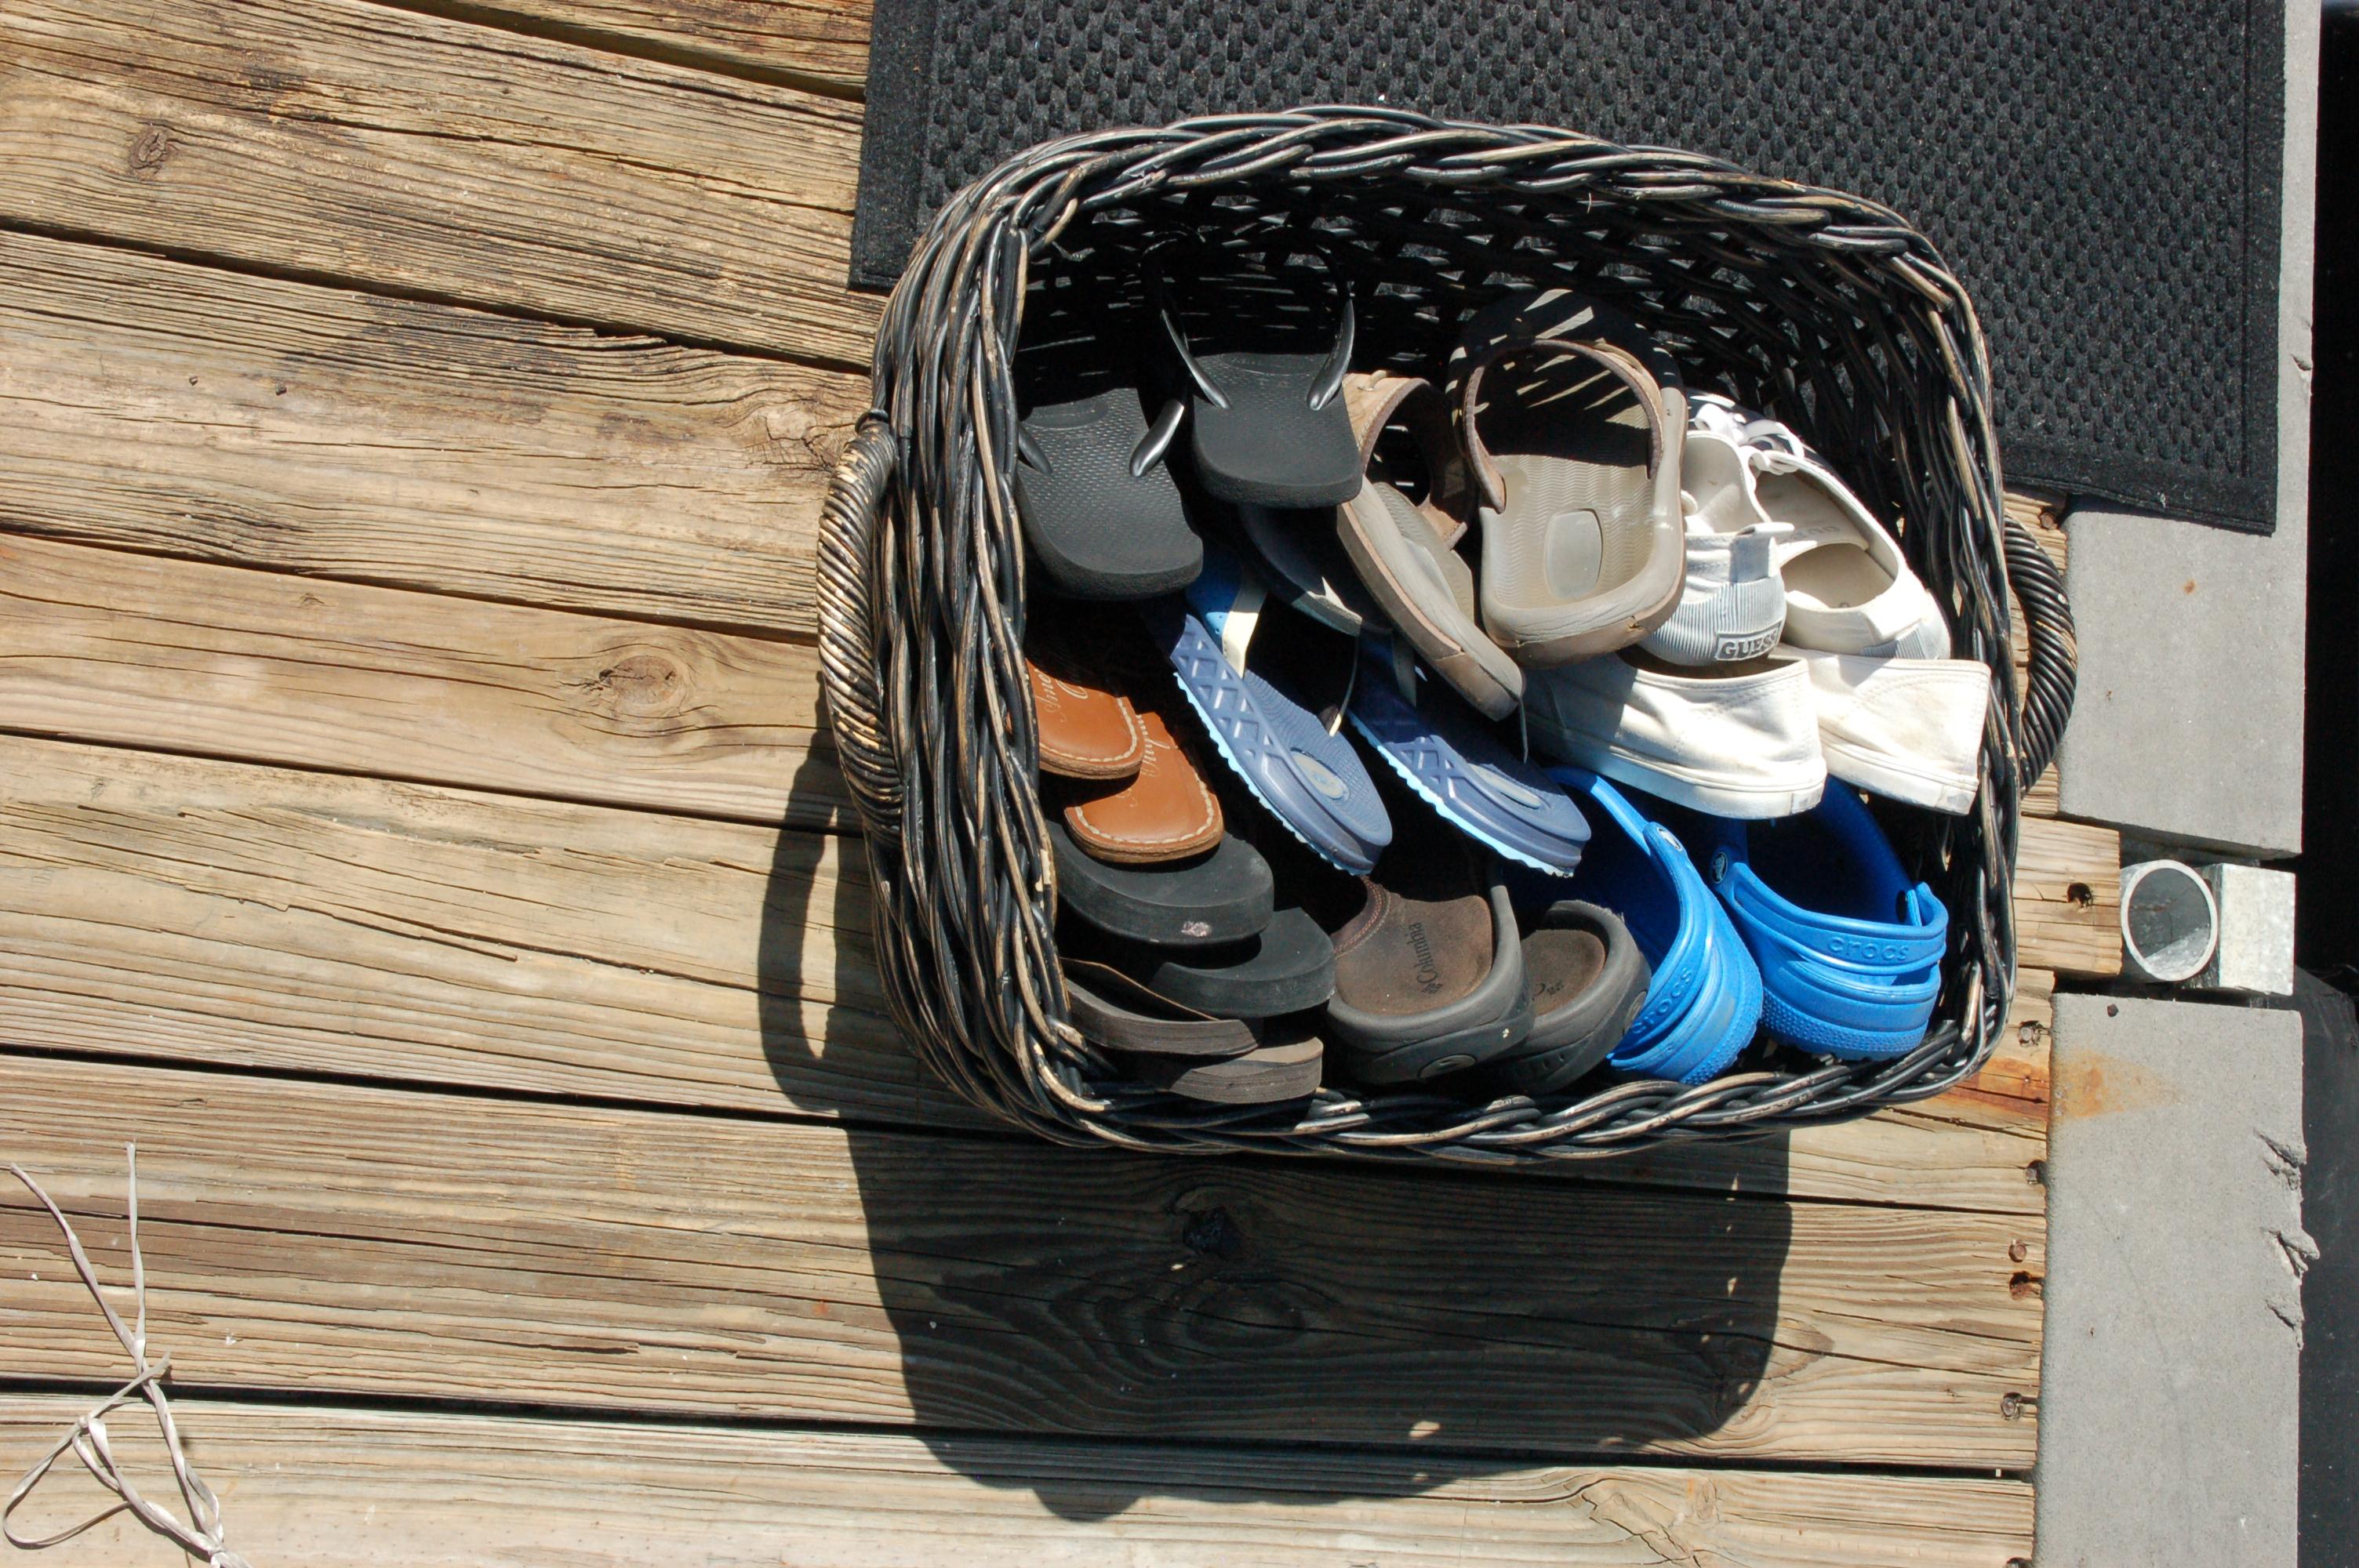 DAY 1 prep docks (shoes)